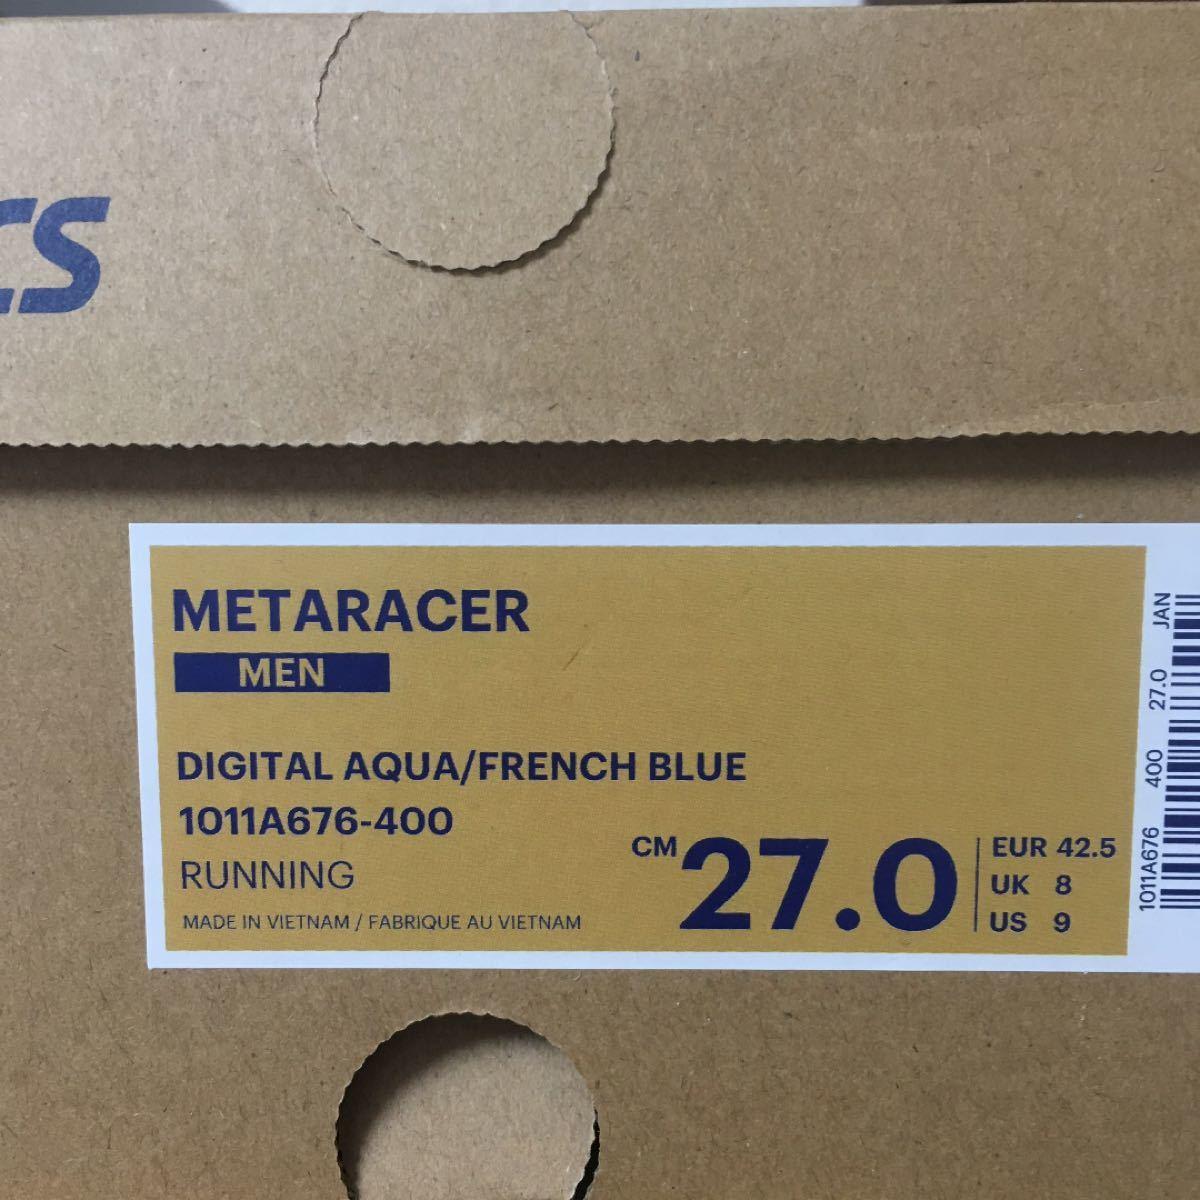 27.0cm メタレーサー アシックス METARACER asics マラソン ランニングシューズ 陸上部長距離